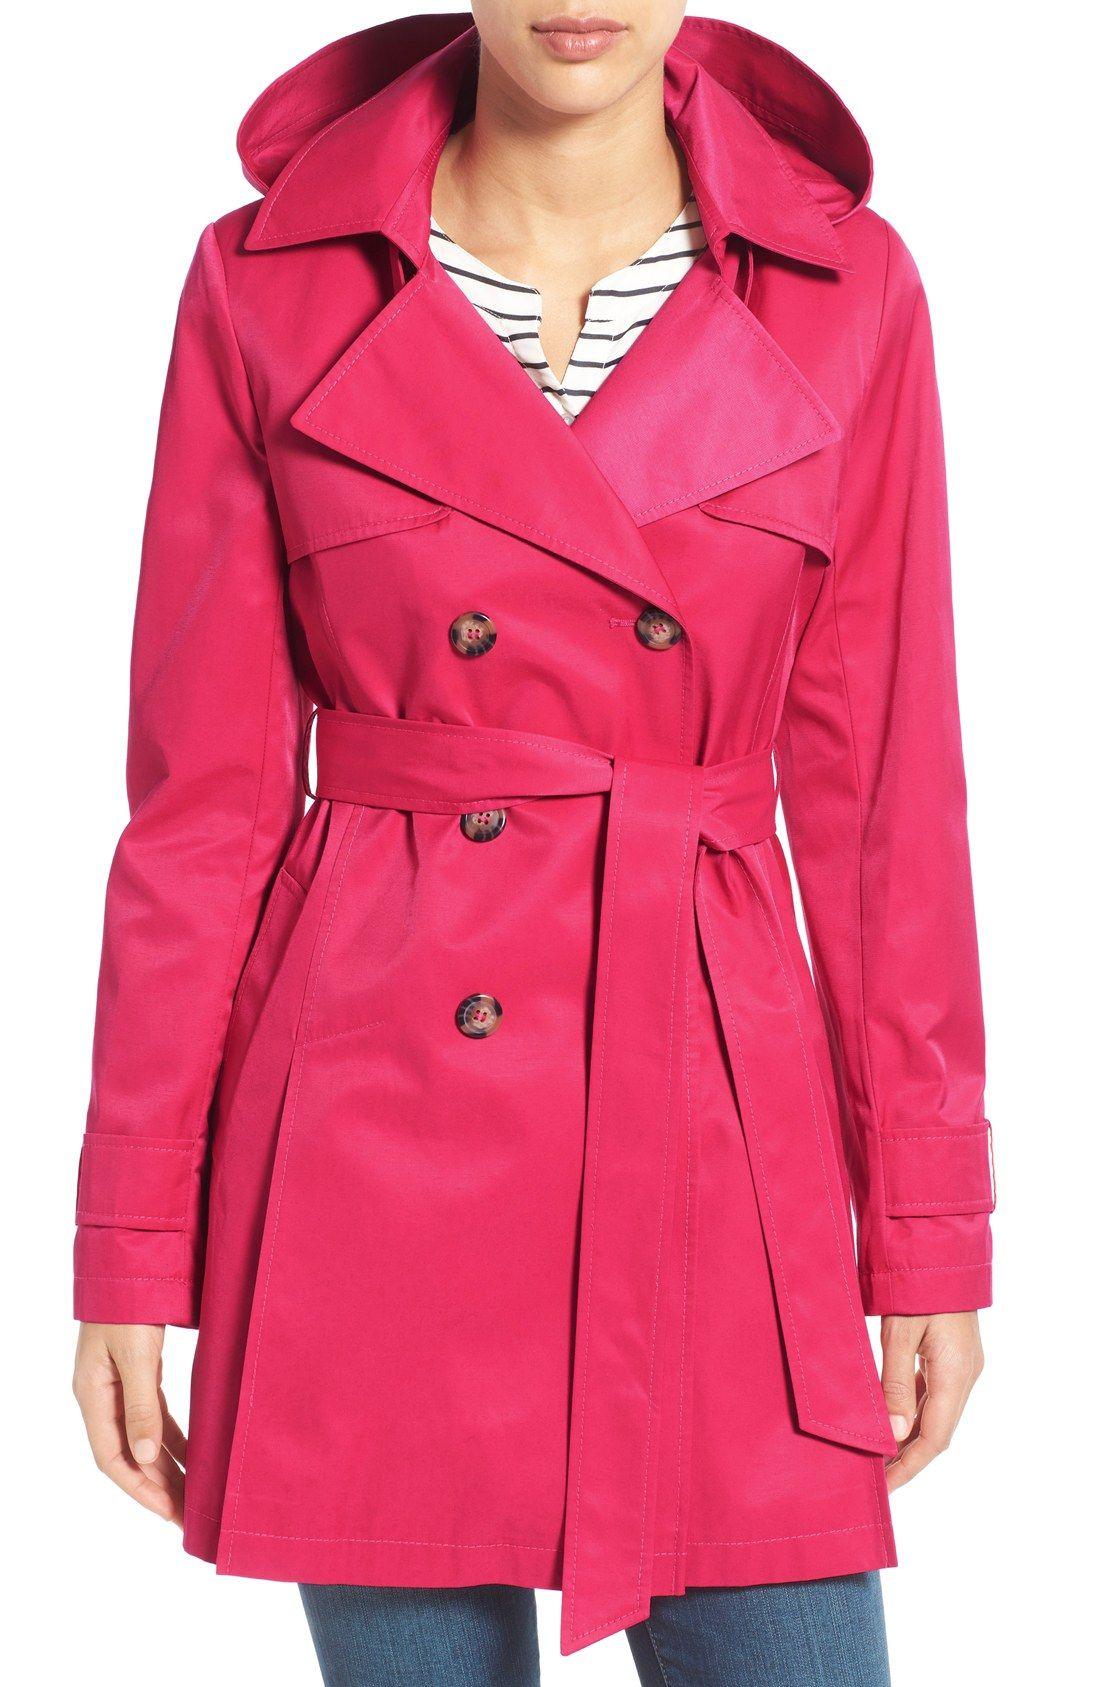 Detachable Hood Trench Coat | Trench, Hoods and Coats